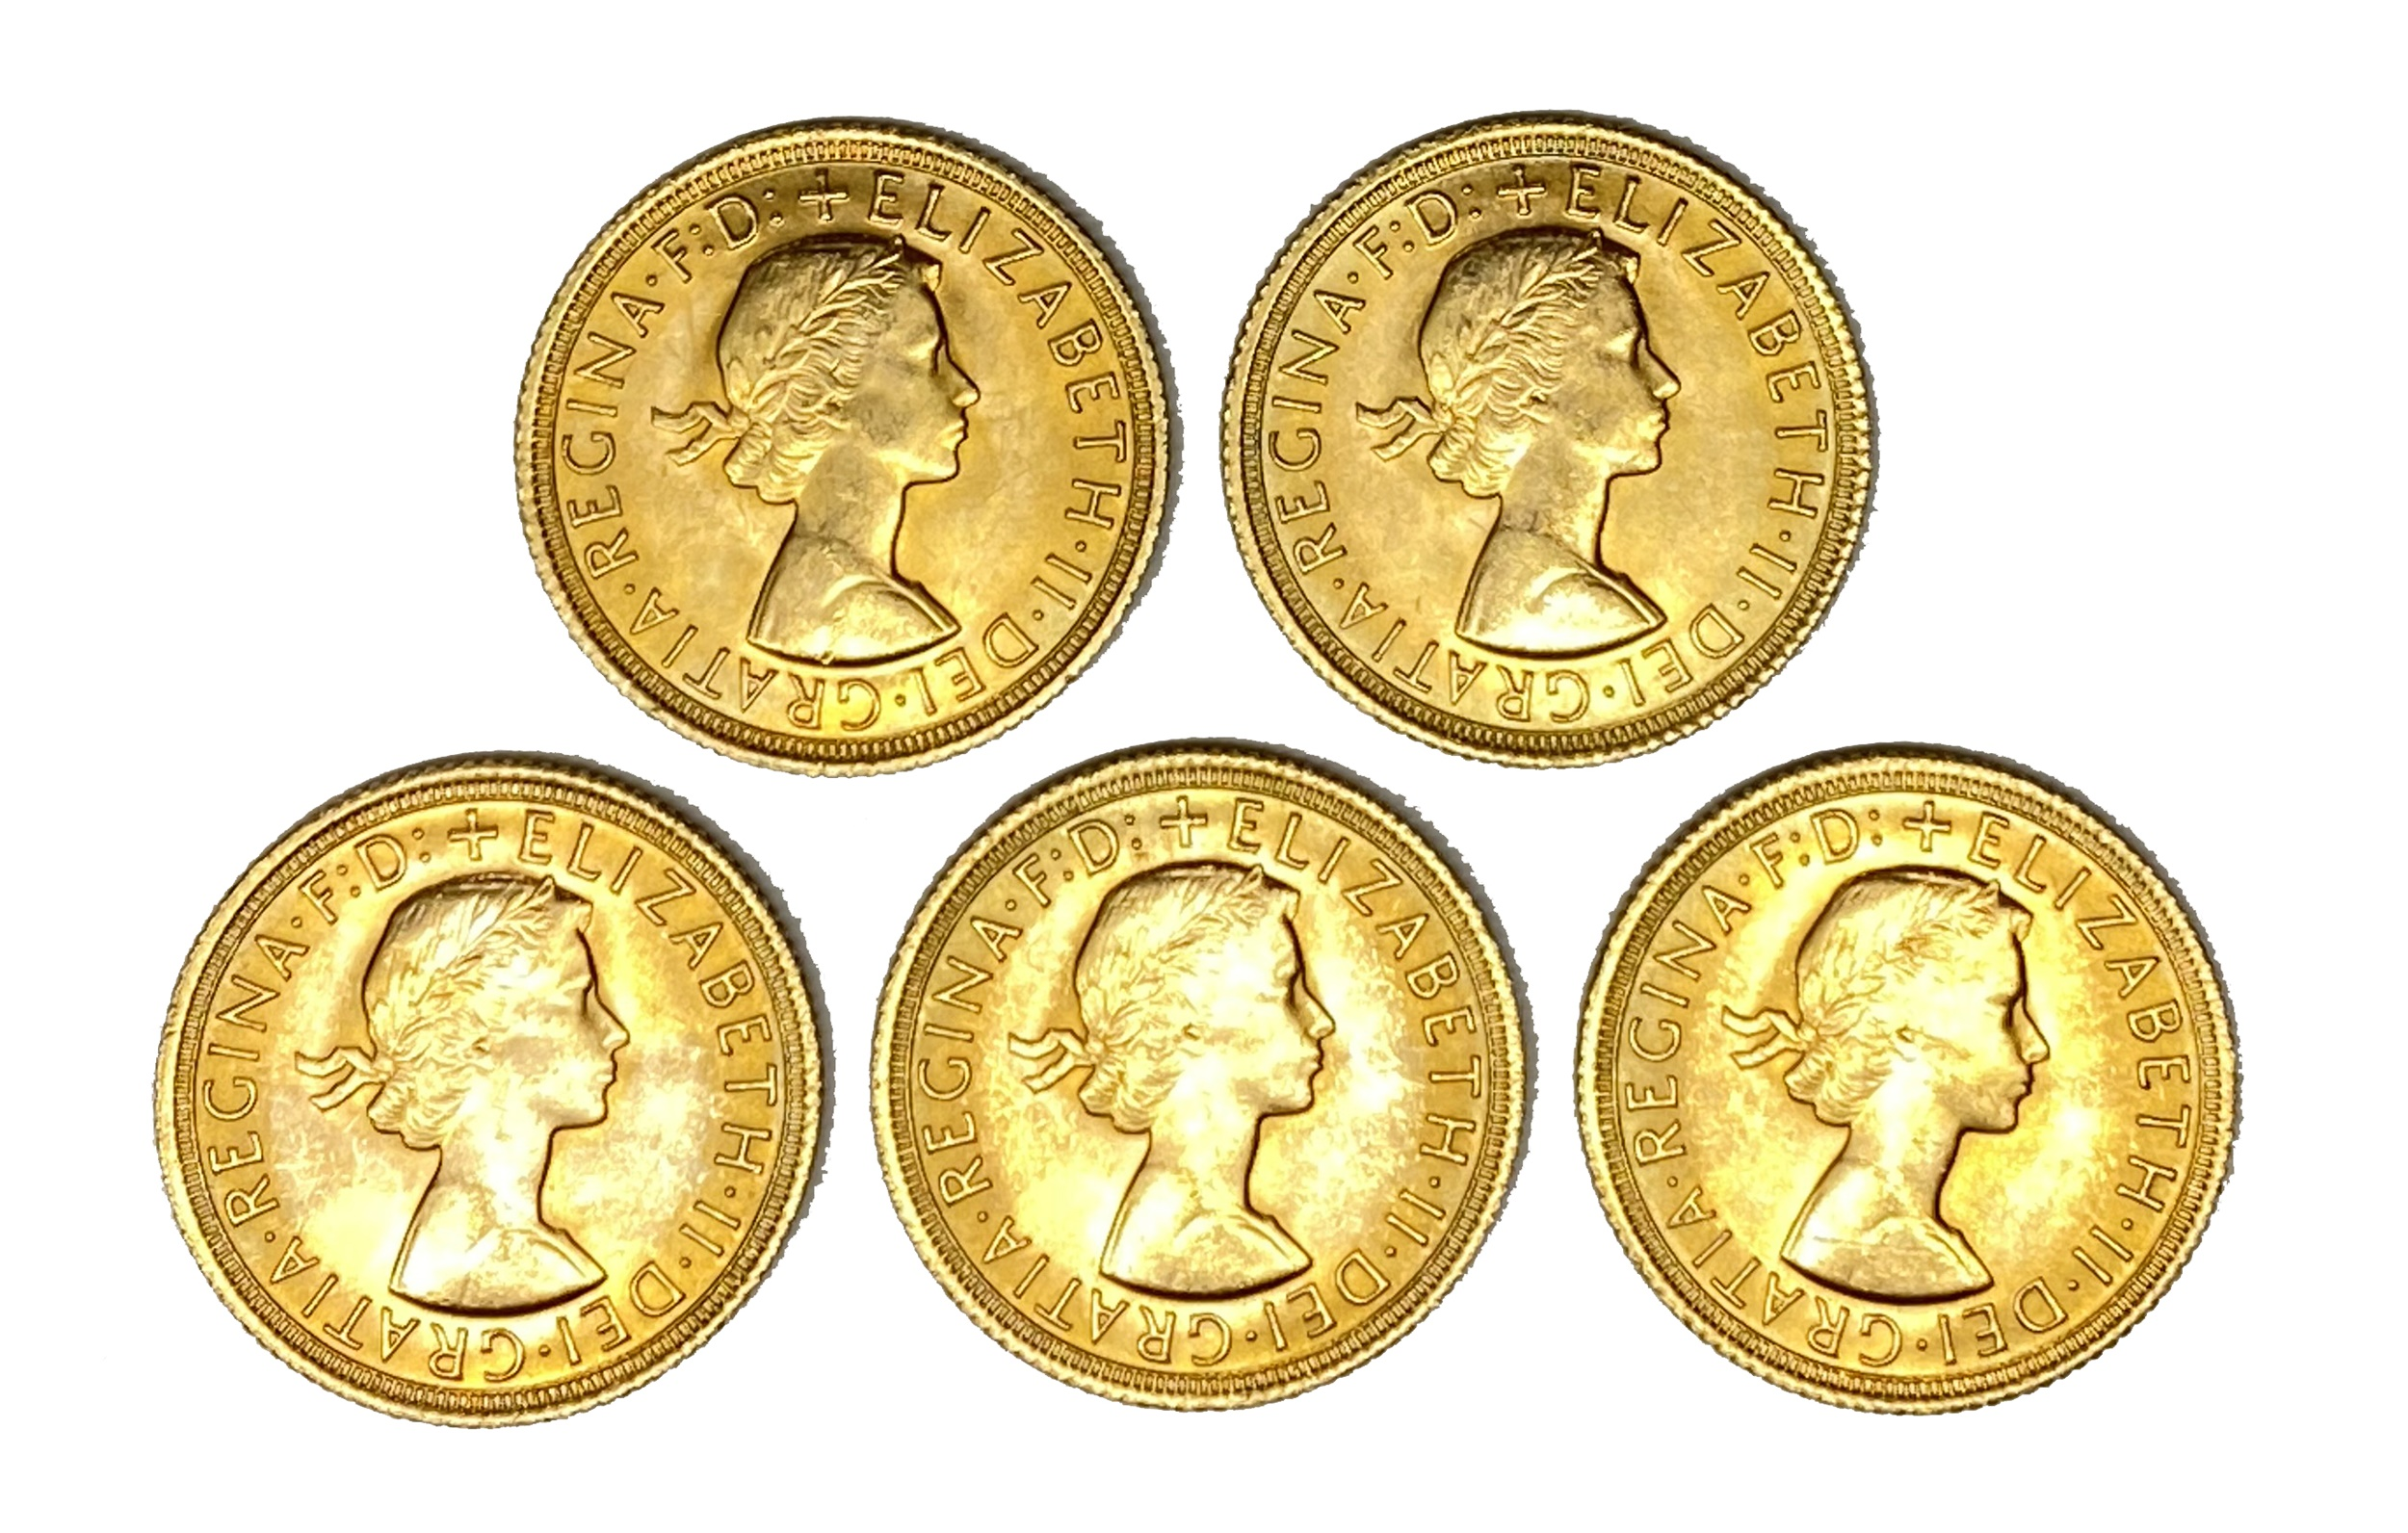 Elizabeth II five gold Sovereign coins, 1967